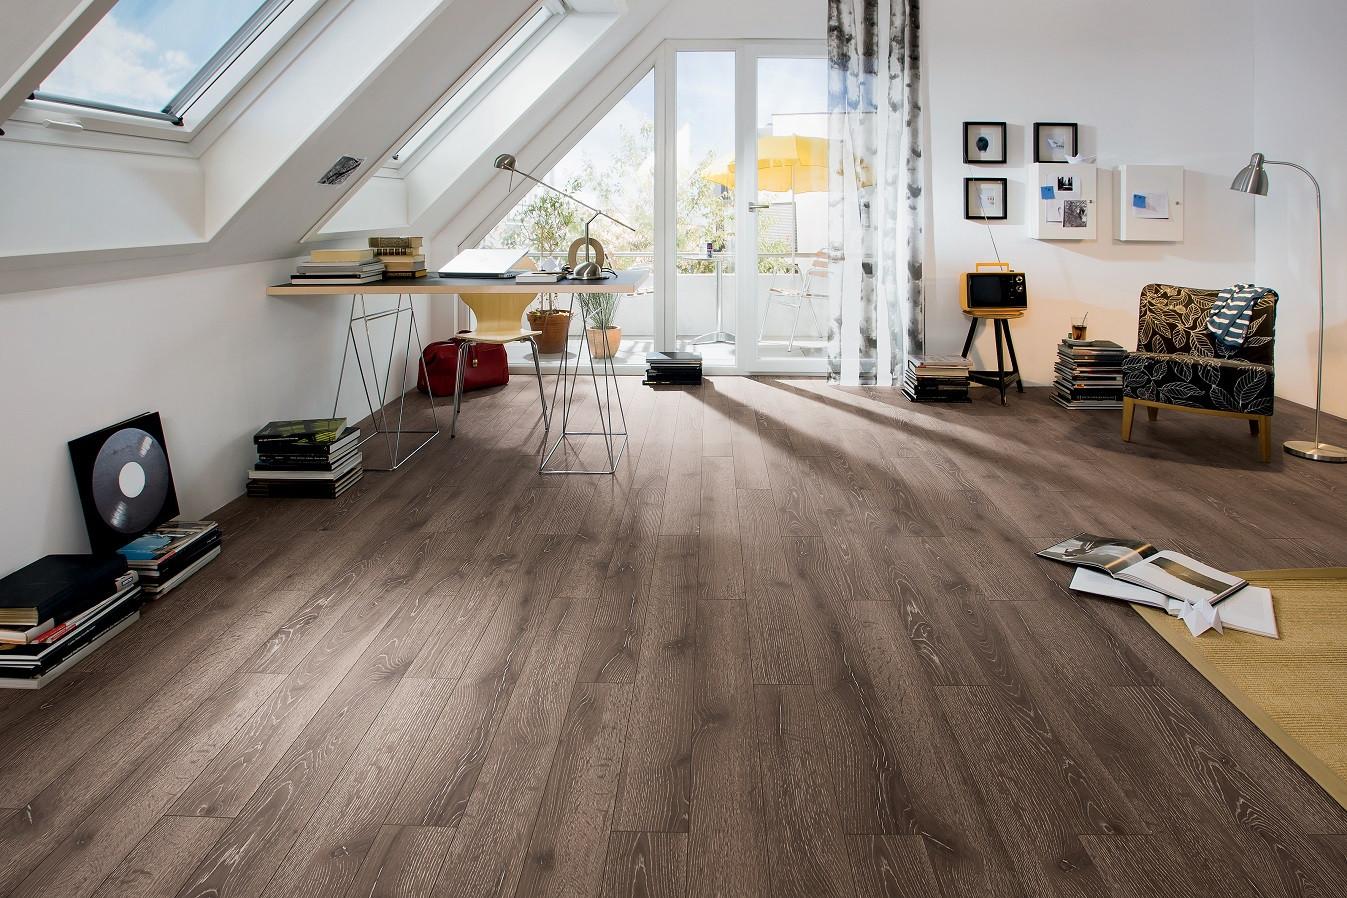 bamboo flooring vs hardwood price of ca laminate flooring california wood floor boards san jose los inside ca best place to buy hardwood flooring